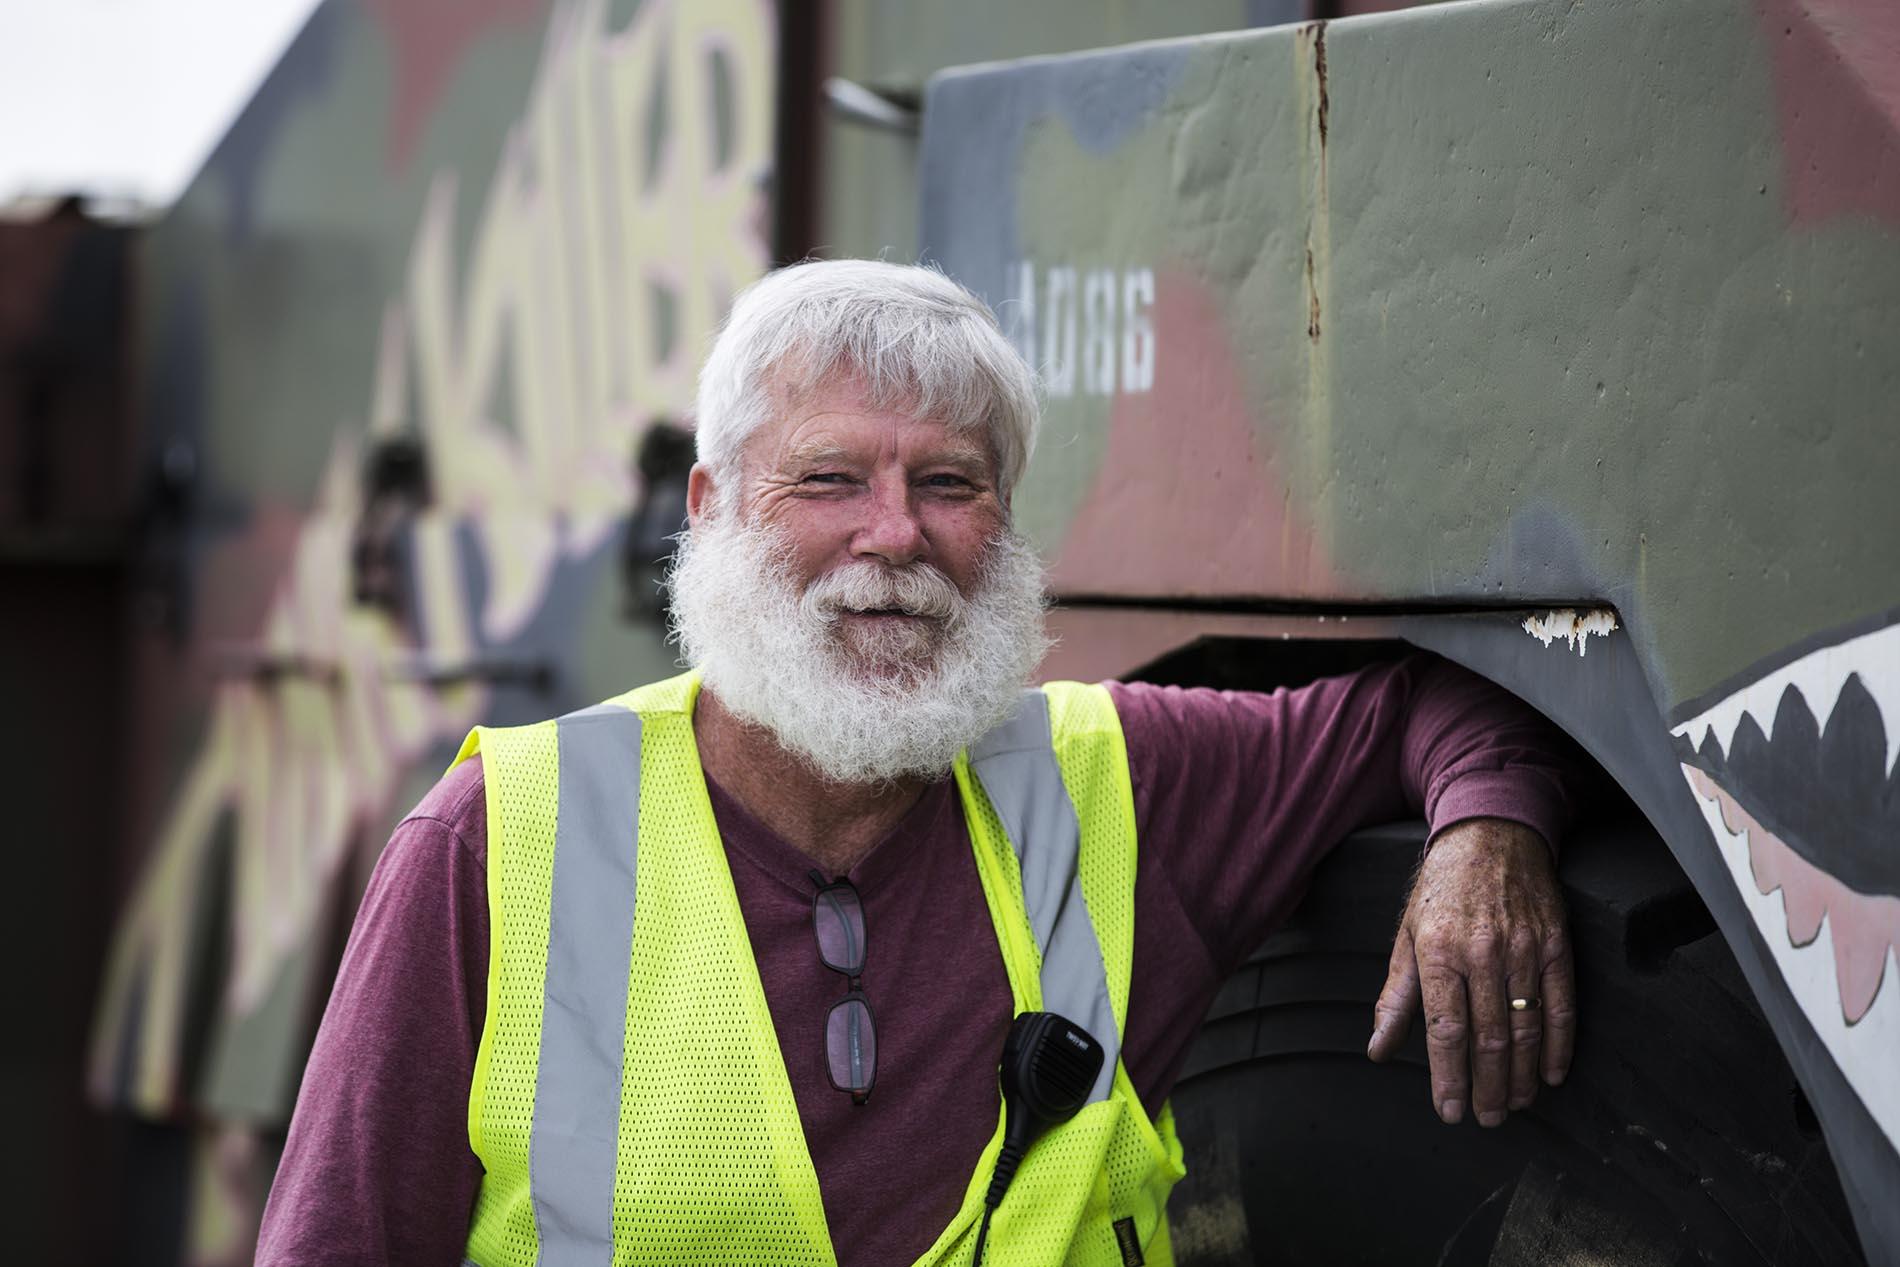 Bearded man green vest